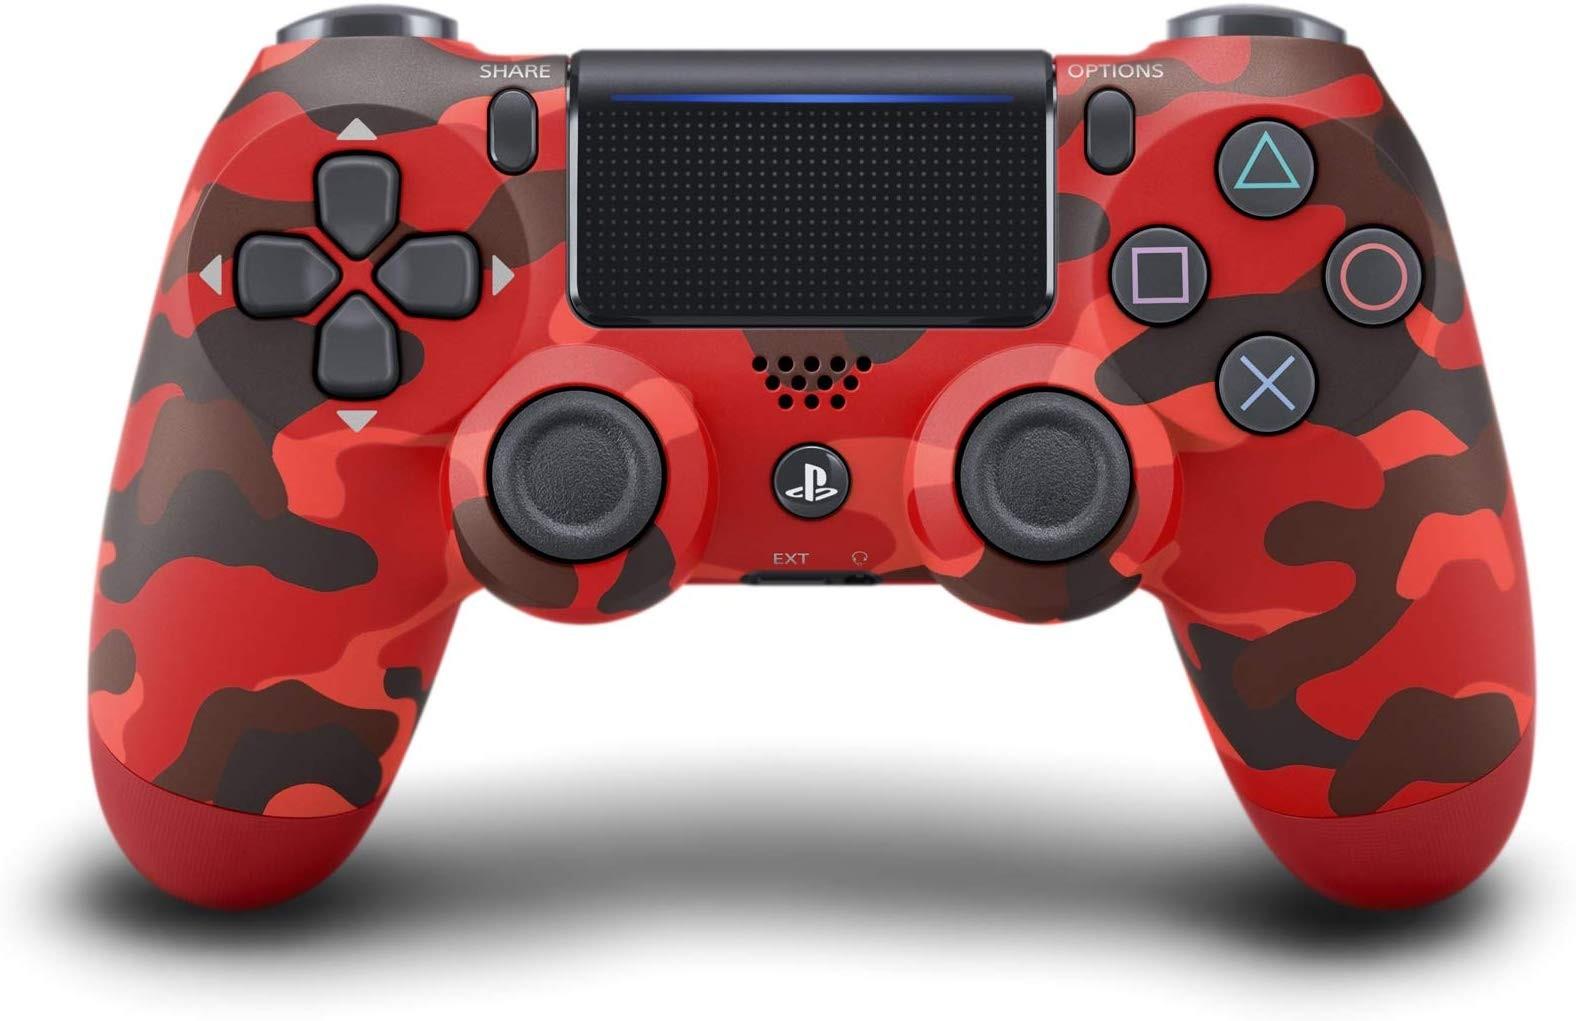 Беспроводной контроллер/джойстик/геймпад DualShock 4 Wireless Controller Red Camo V2